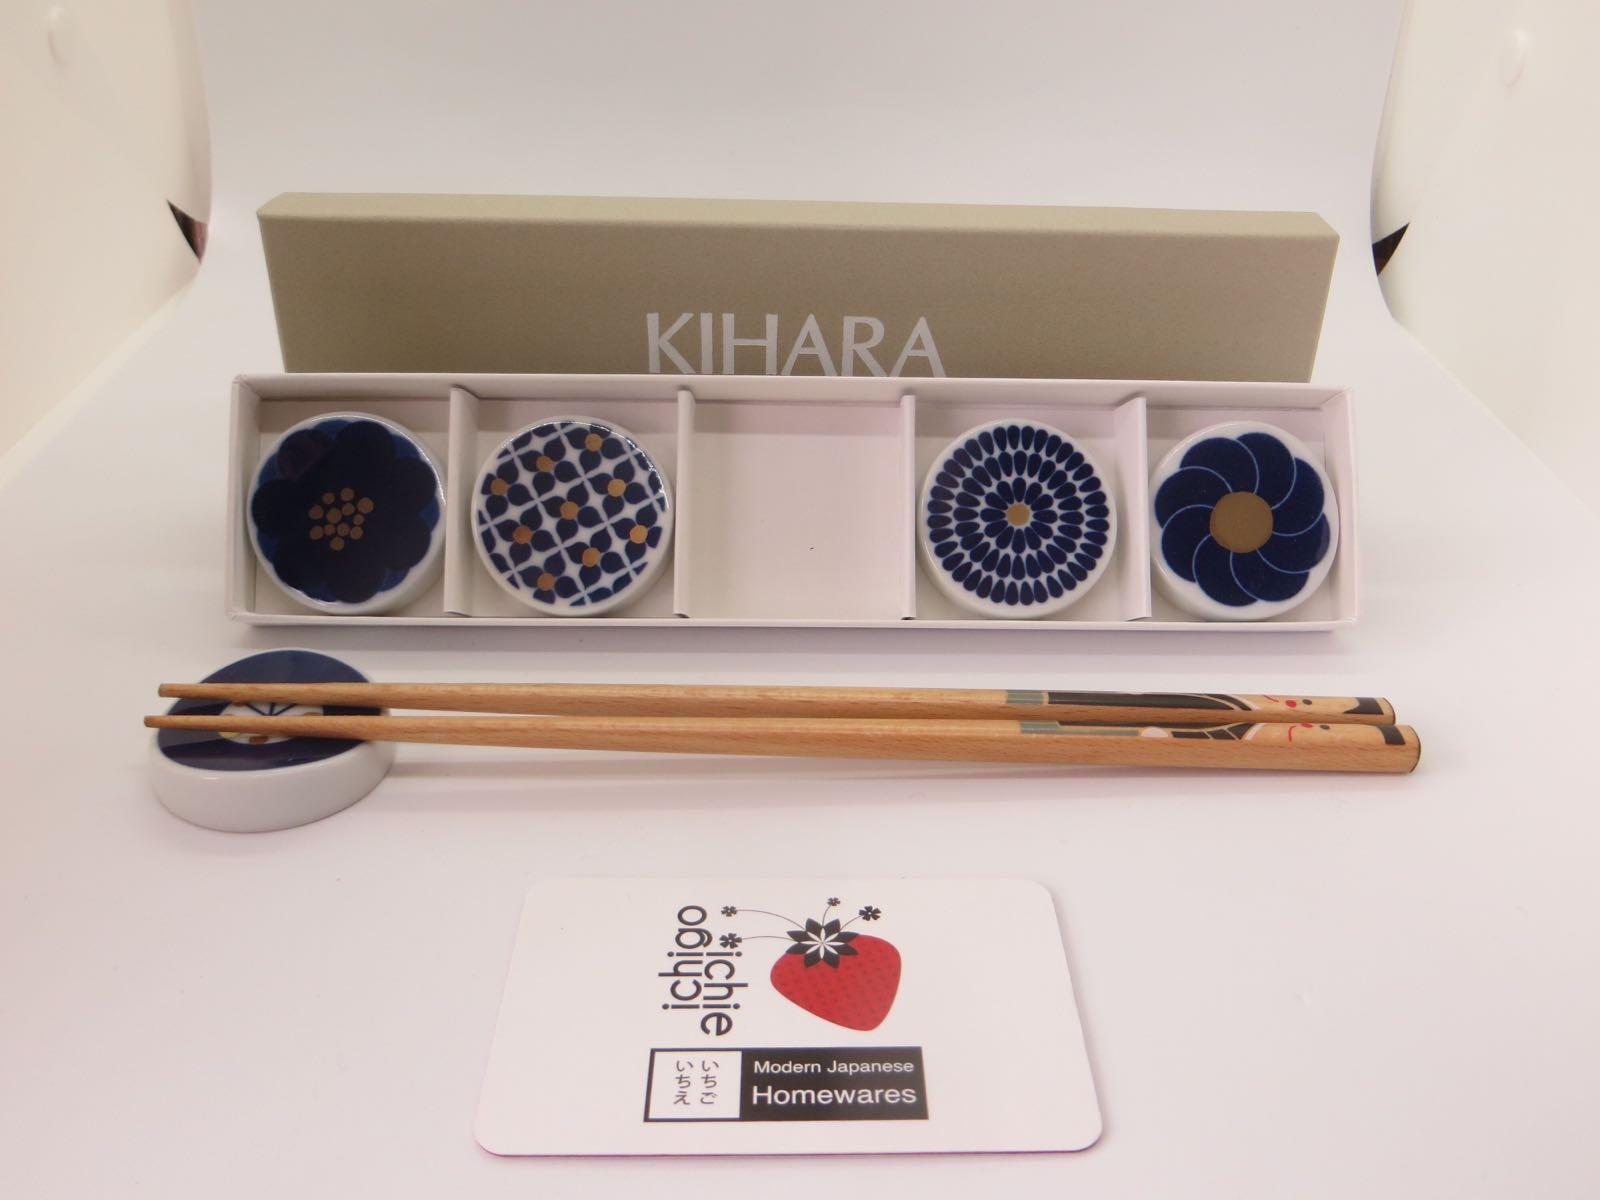 KIHARA Chopstick Holders - Botanical (Set of 5)